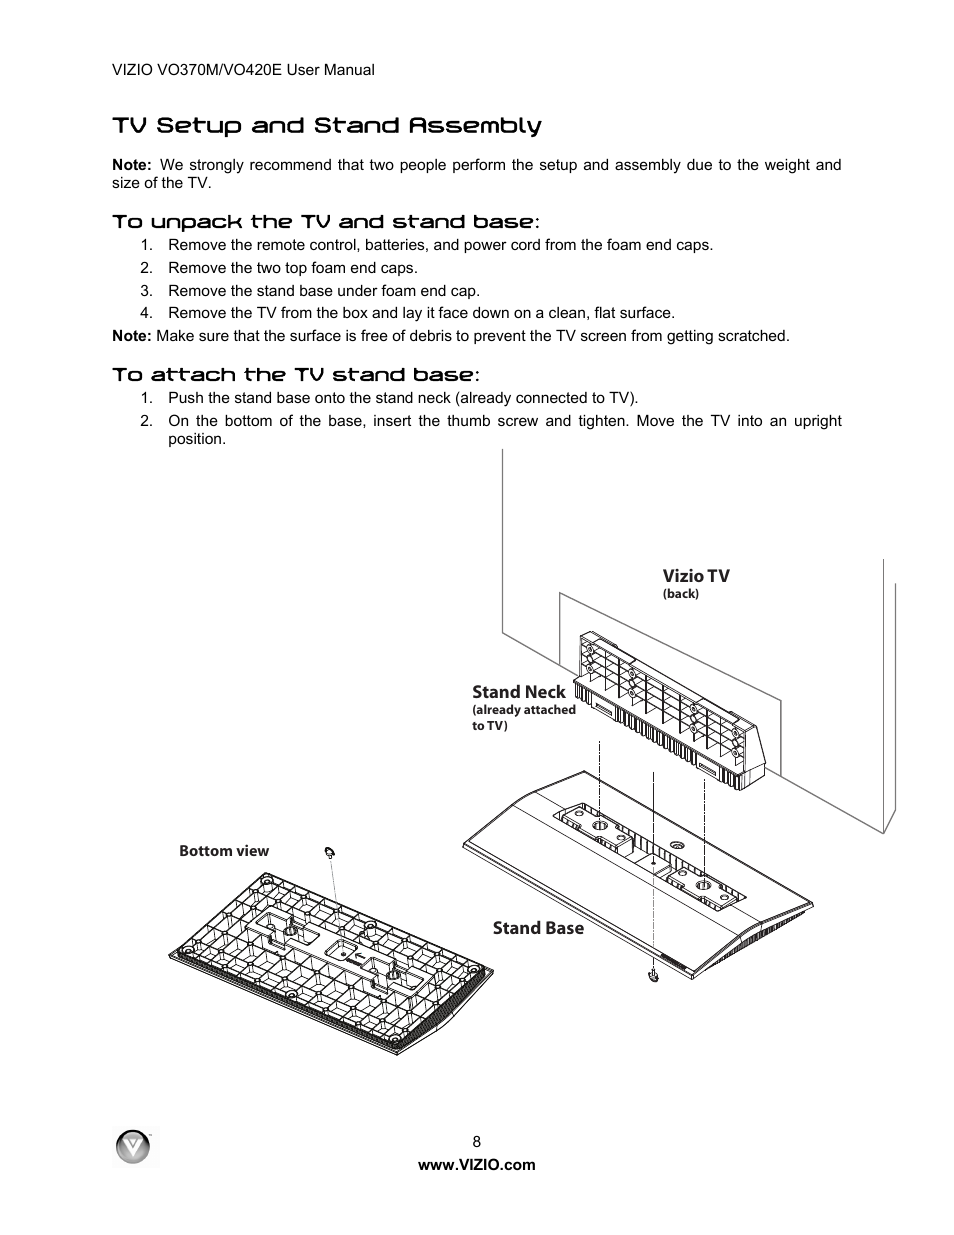 tv setup and stand assembly vizio vo420e user manual page 8 67 rh manualsdir com Walmart Vizio 42 Vizio VO420E Specs